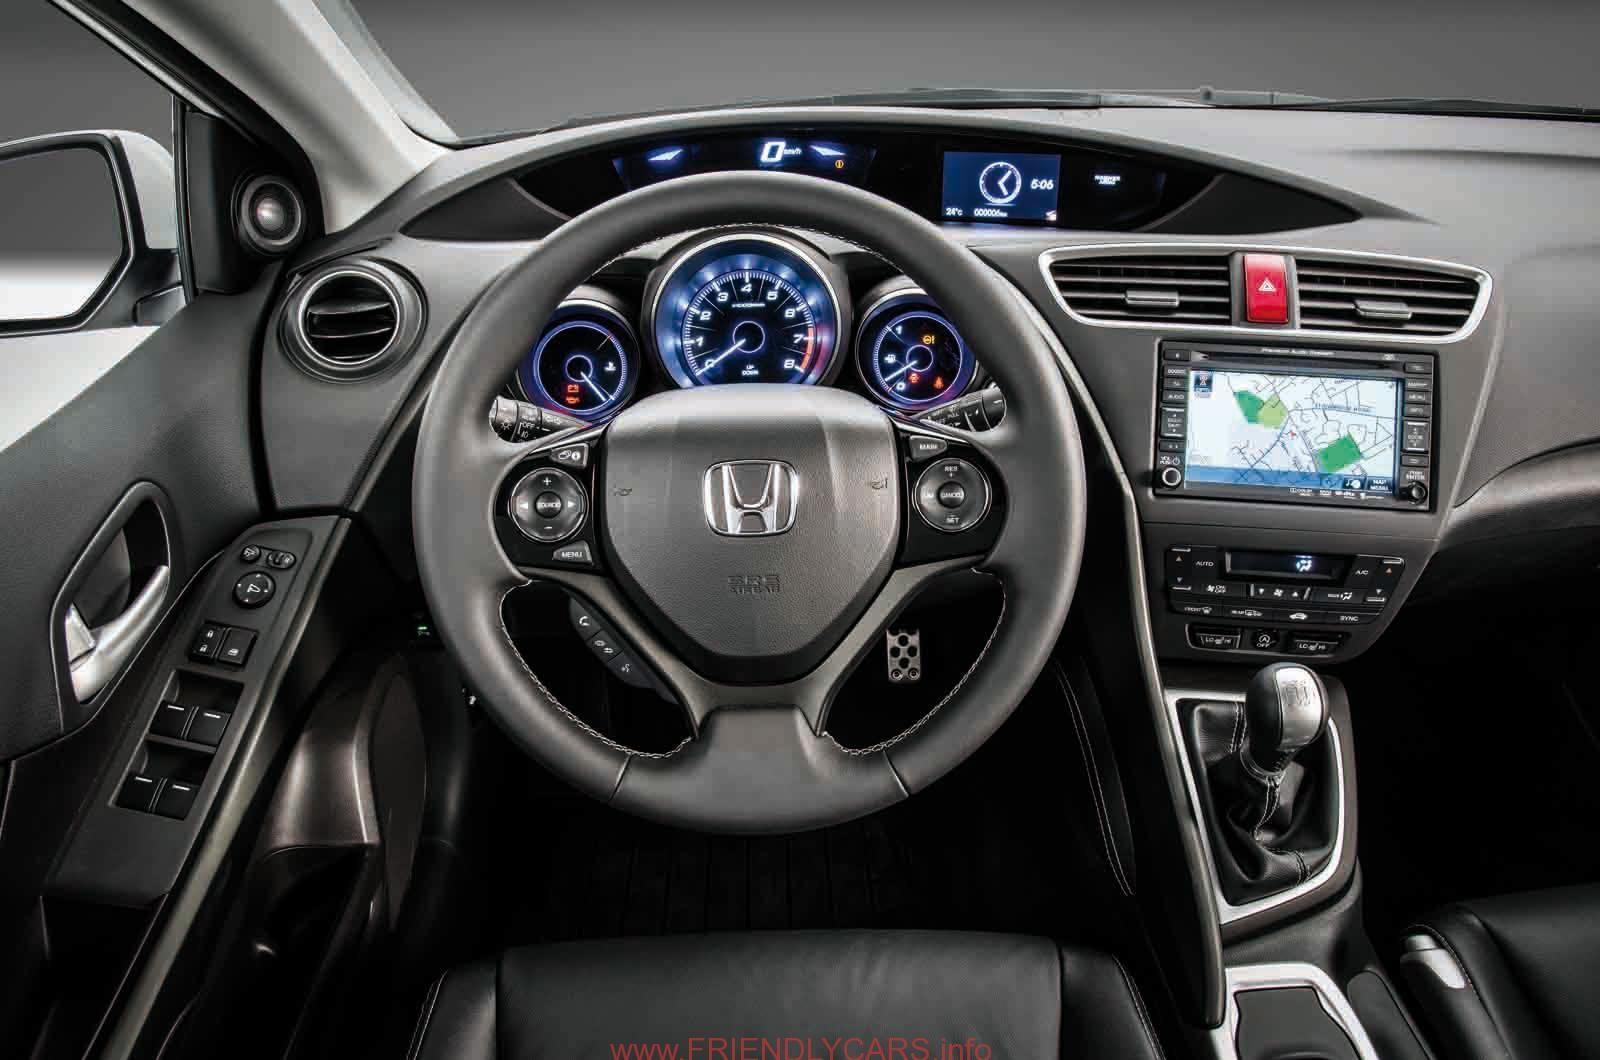 Honda civic si 2008 interior automotive center pinterest honda civic si honda civic and honda